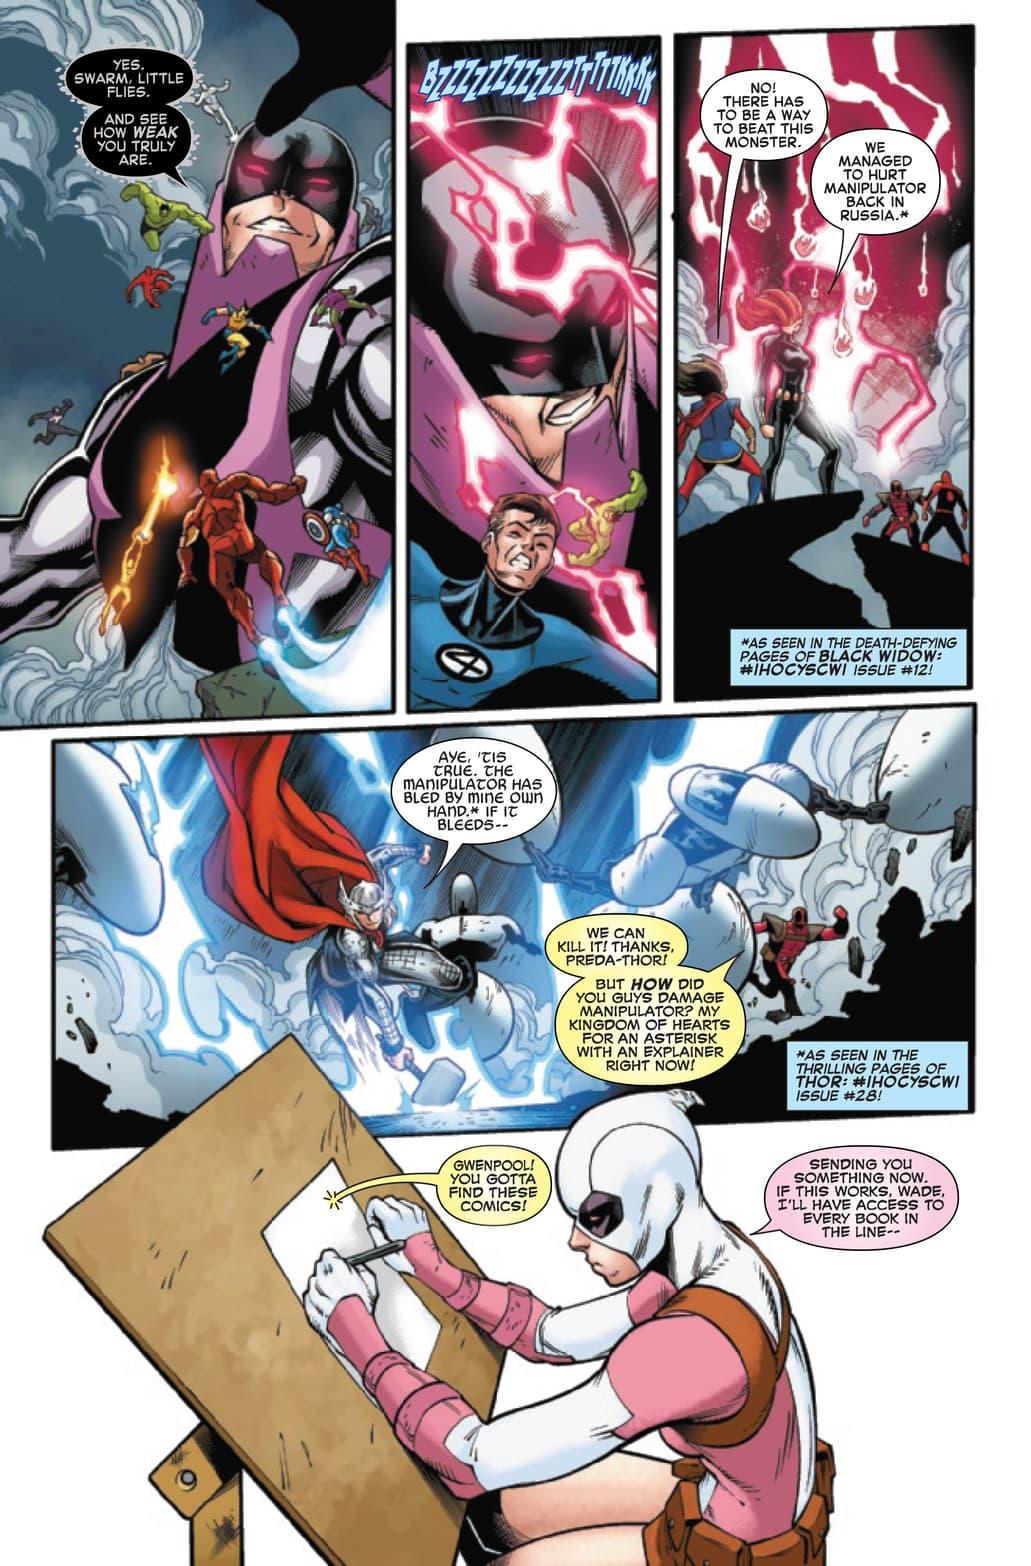 Spider-Man/Deadpool #49